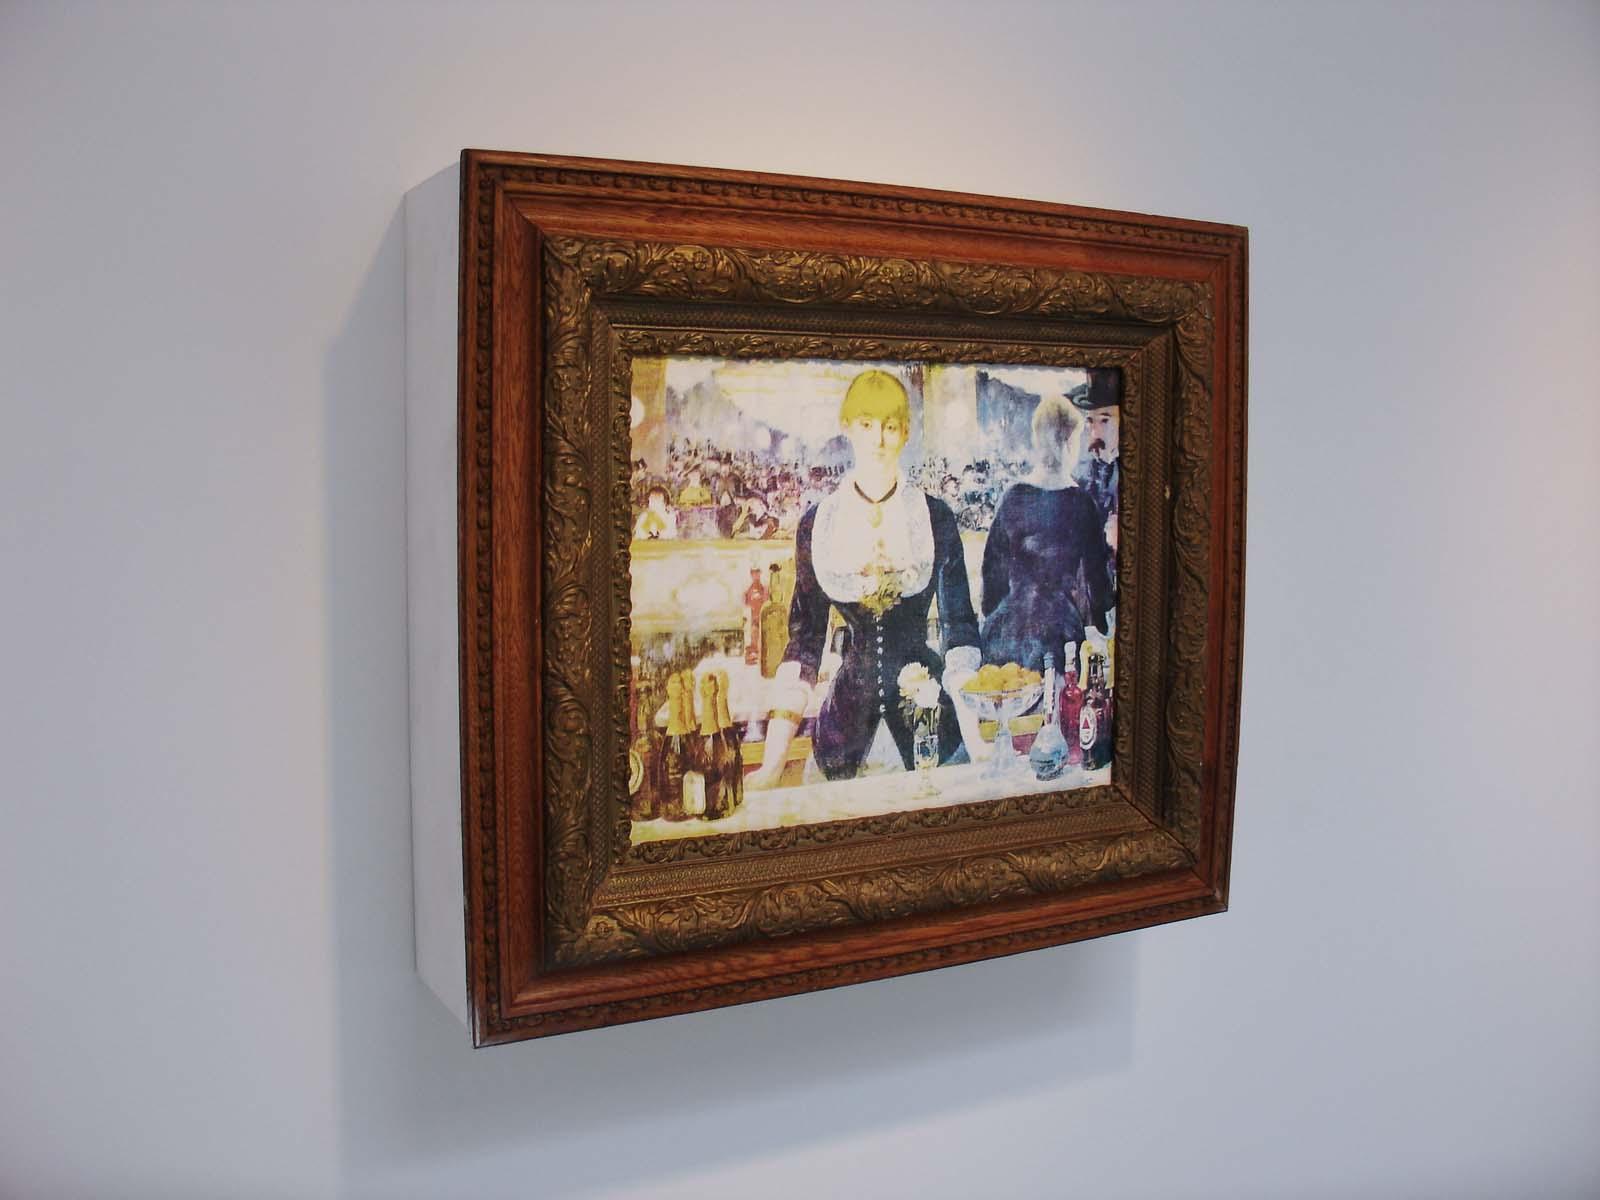 A Bar… , 2009-10, 27.5 x 31.25 x 8.5 inches, screen-print on masonite, found frame, plywood, glass, whiskey